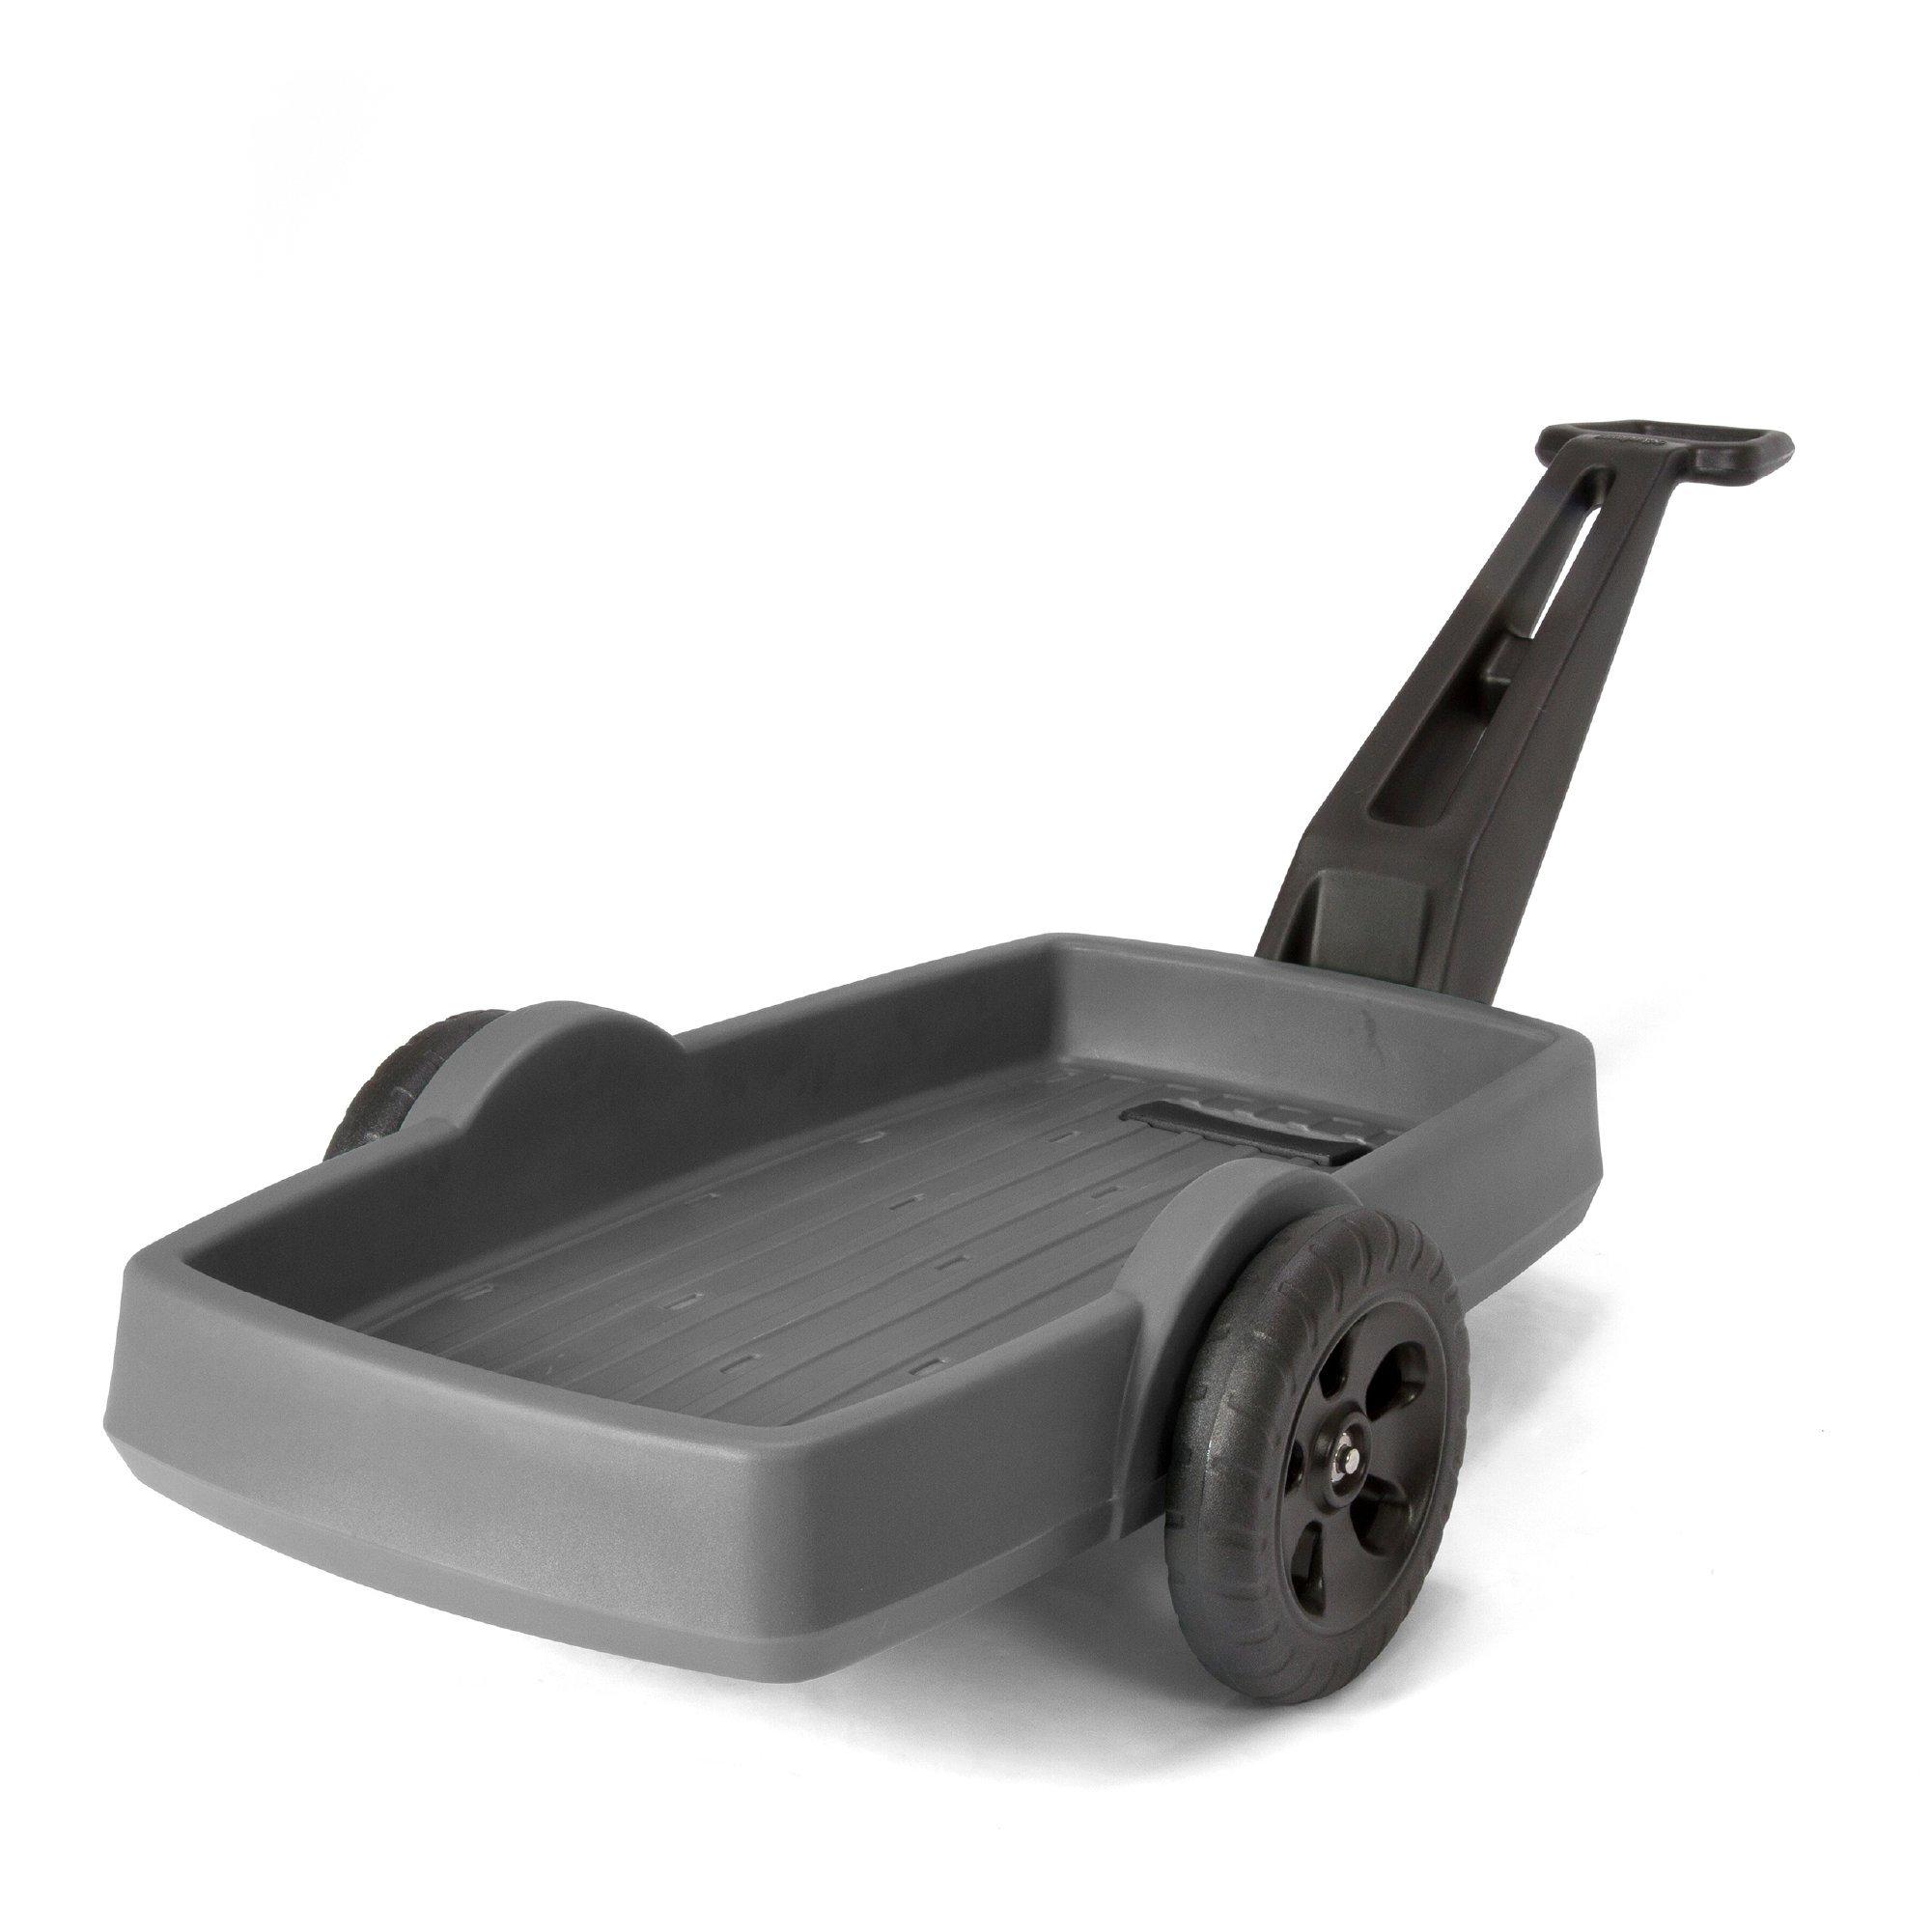 Simplay3 Easy Haul Plastic Flat Bed Yard and Garden Wagon, Heavy Duty 200 lbs. Capacity (Gray)